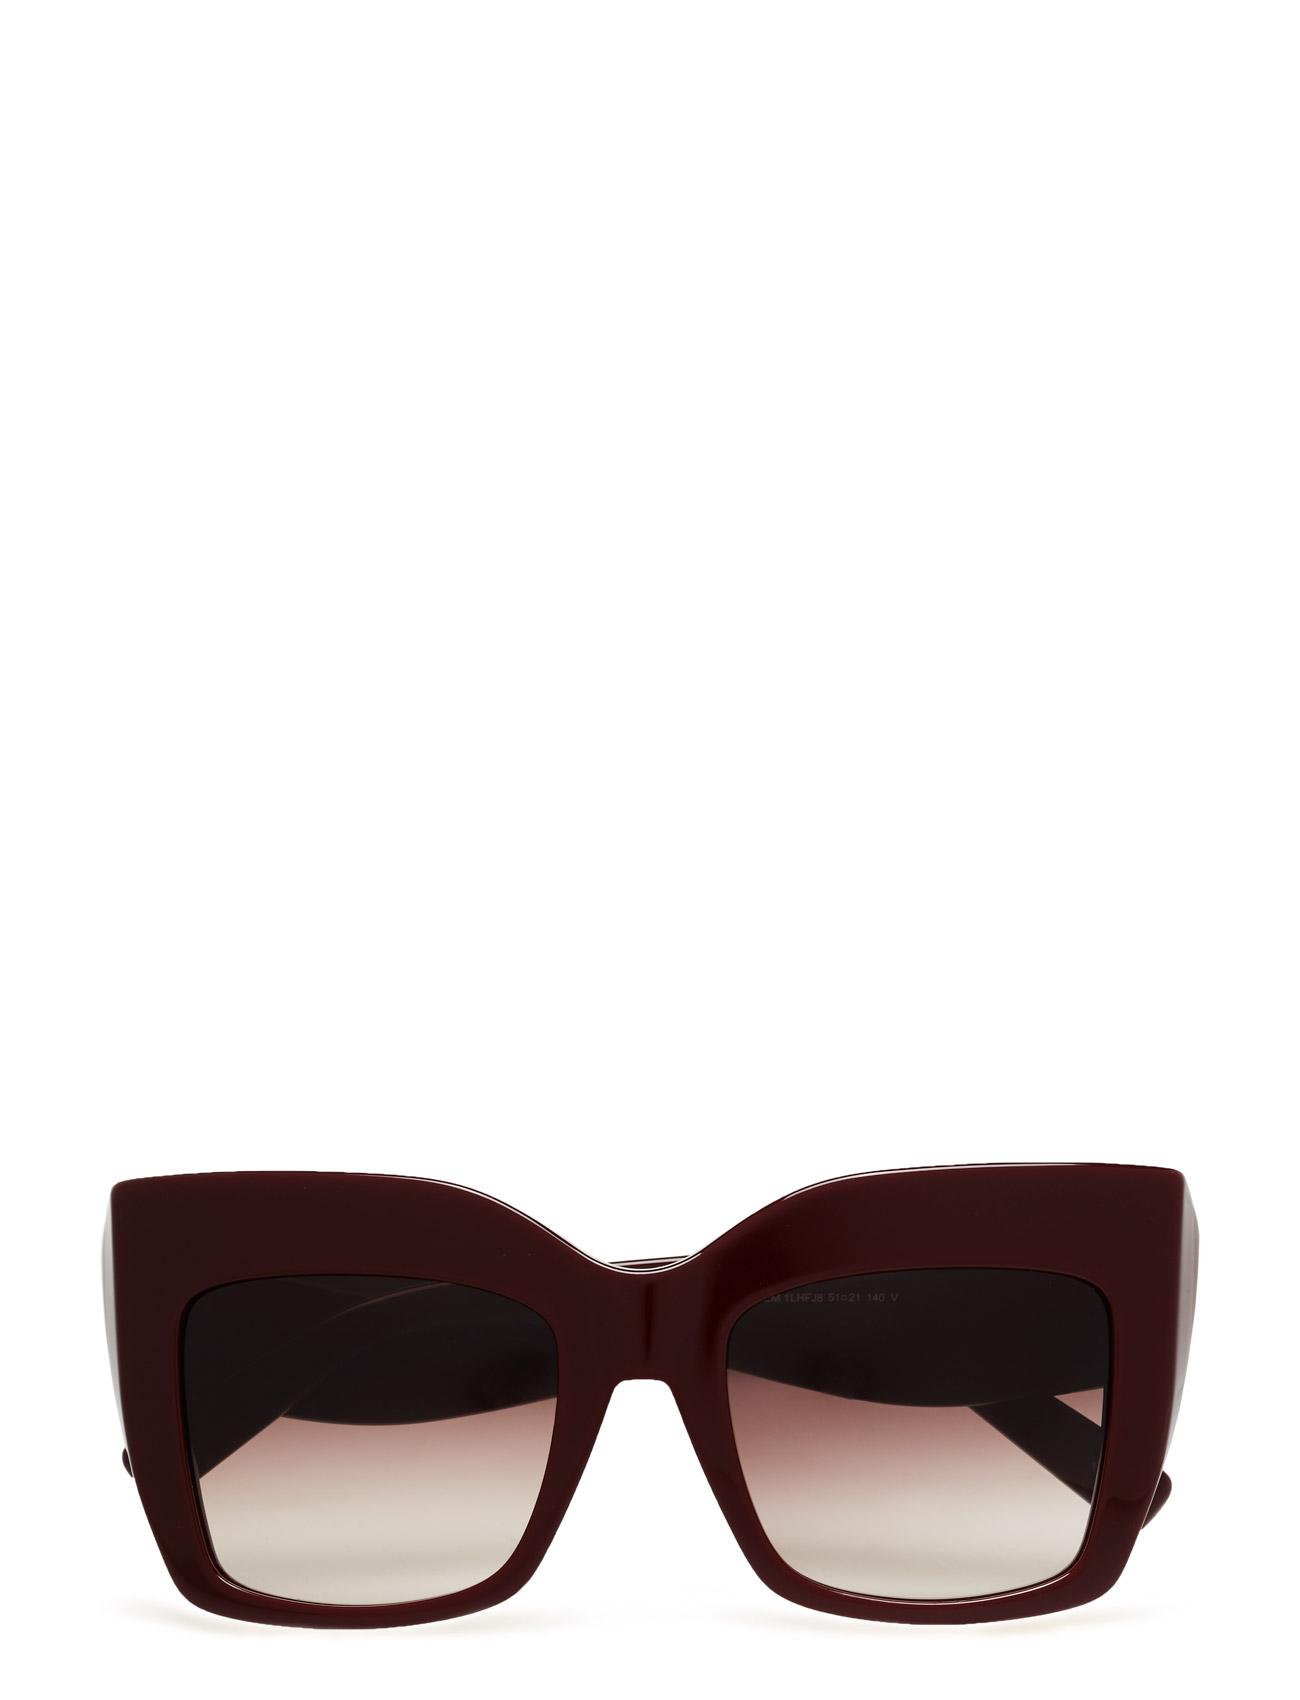 Maxmara Gem 1 MAXMARA Sunglasses Solbriller til Kvinder i Sort